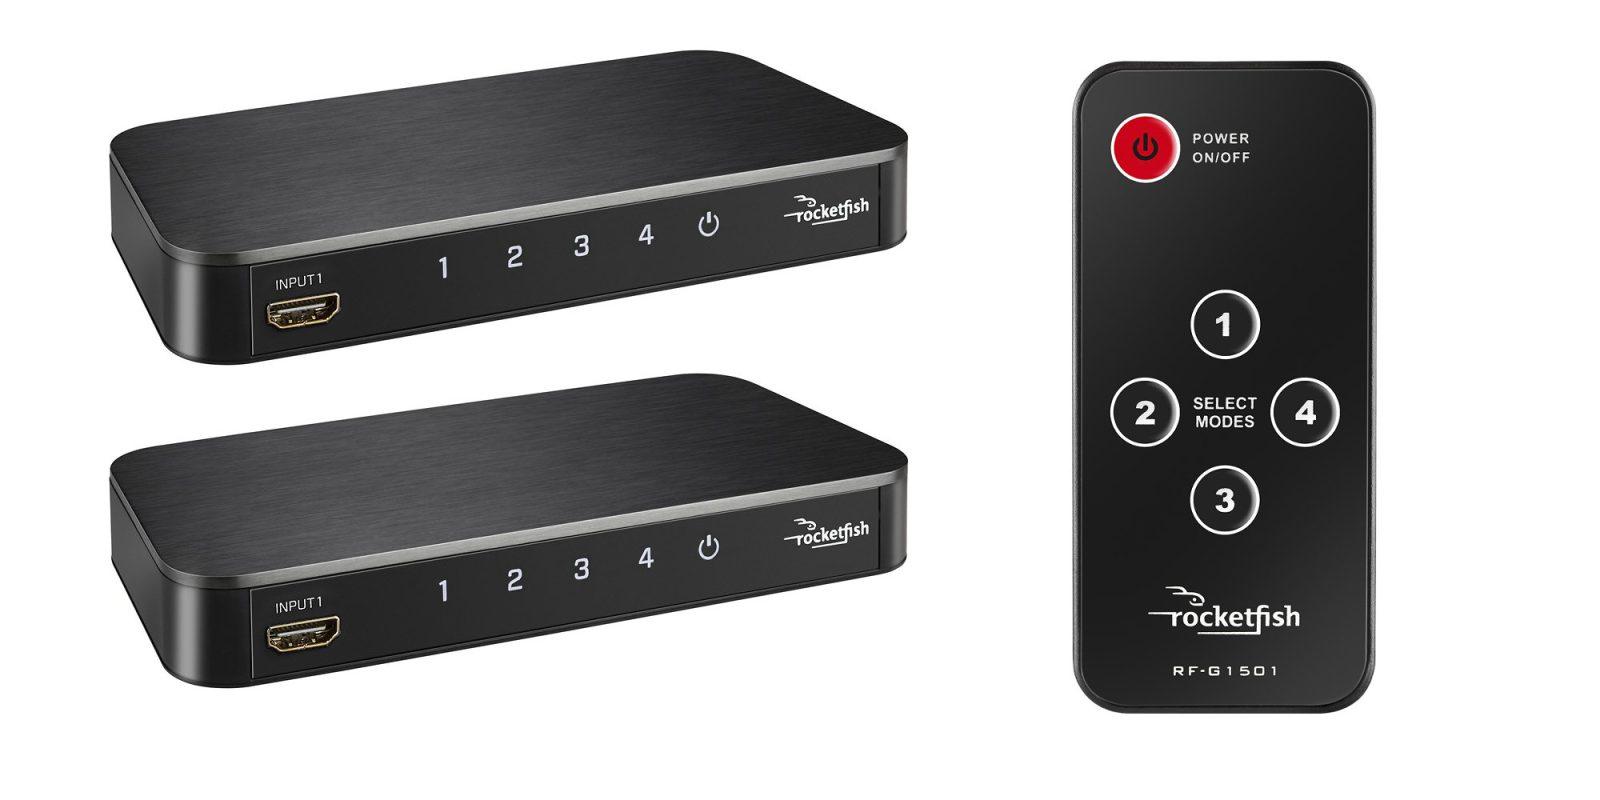 Rocketfish's 4-Port 4K HDMI Switch Box plus remote now down